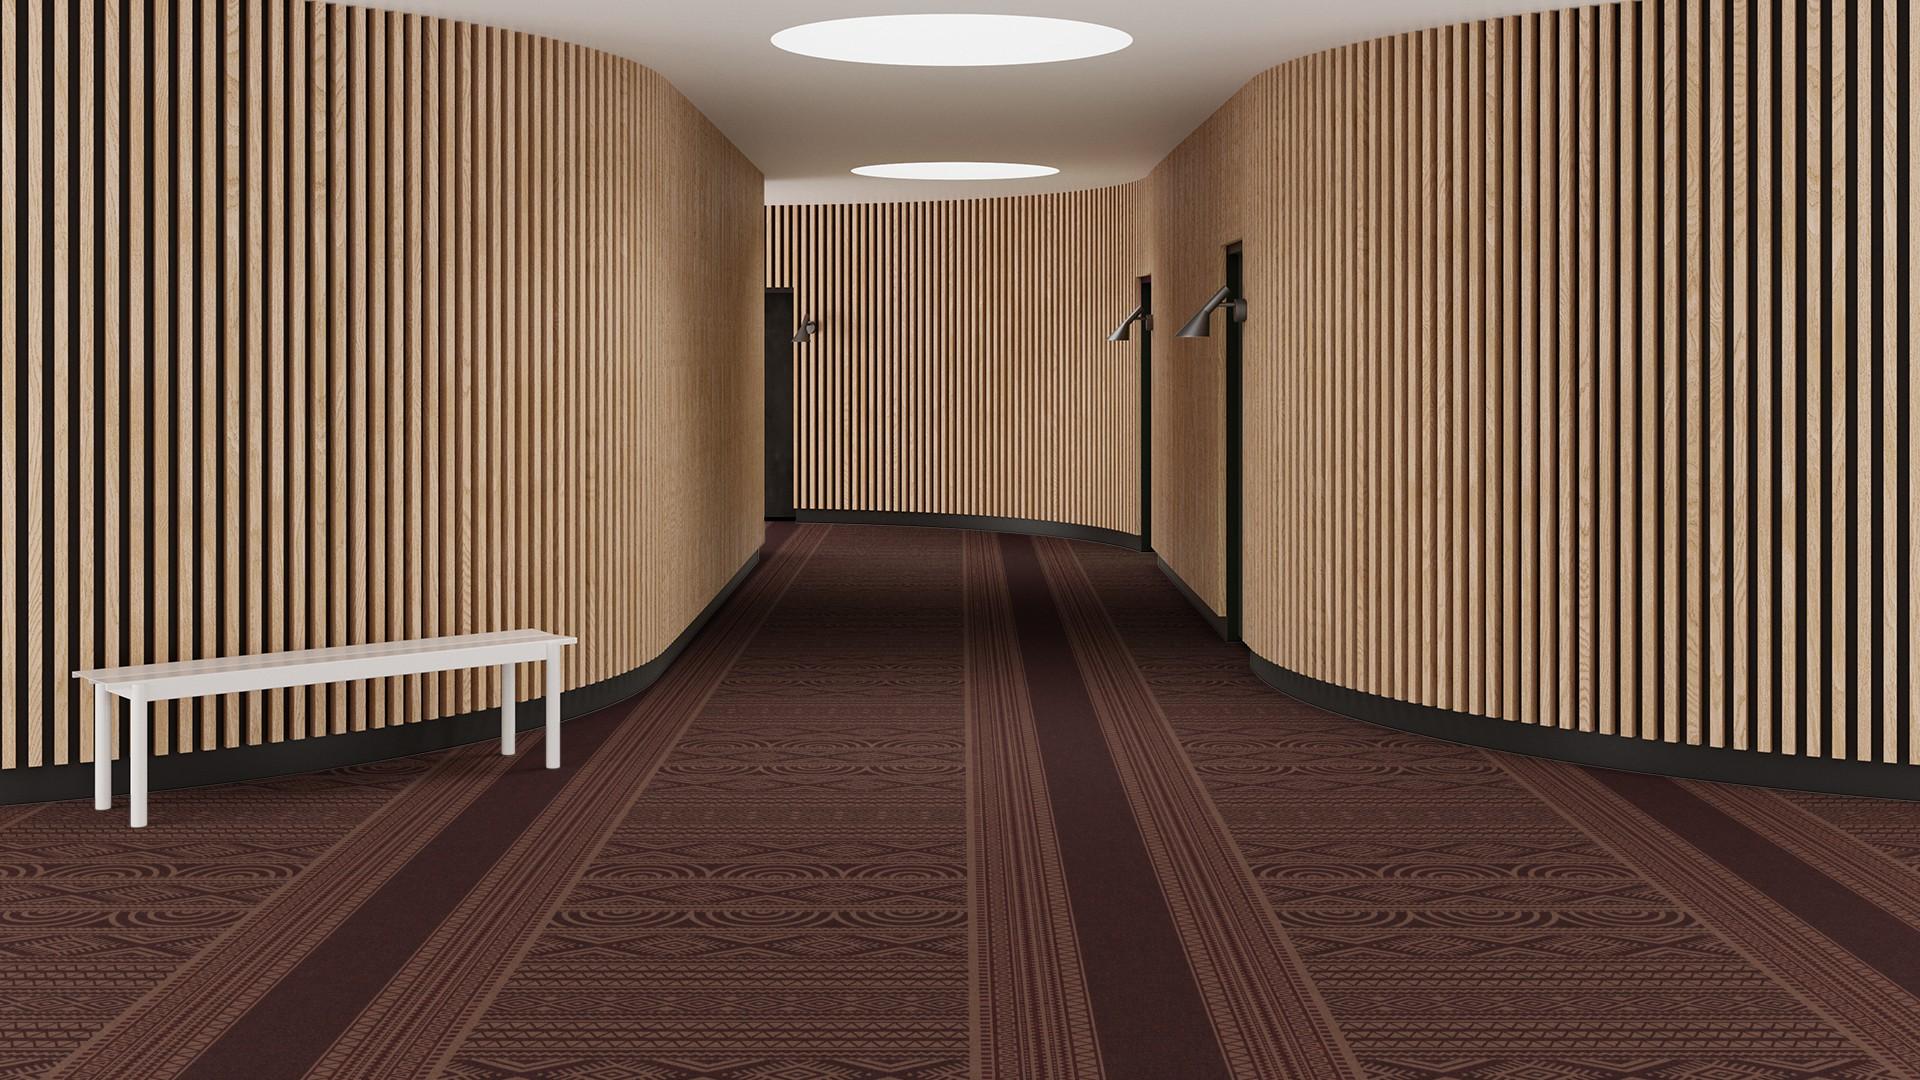 ghana corridor 195 cm red RoowView 3